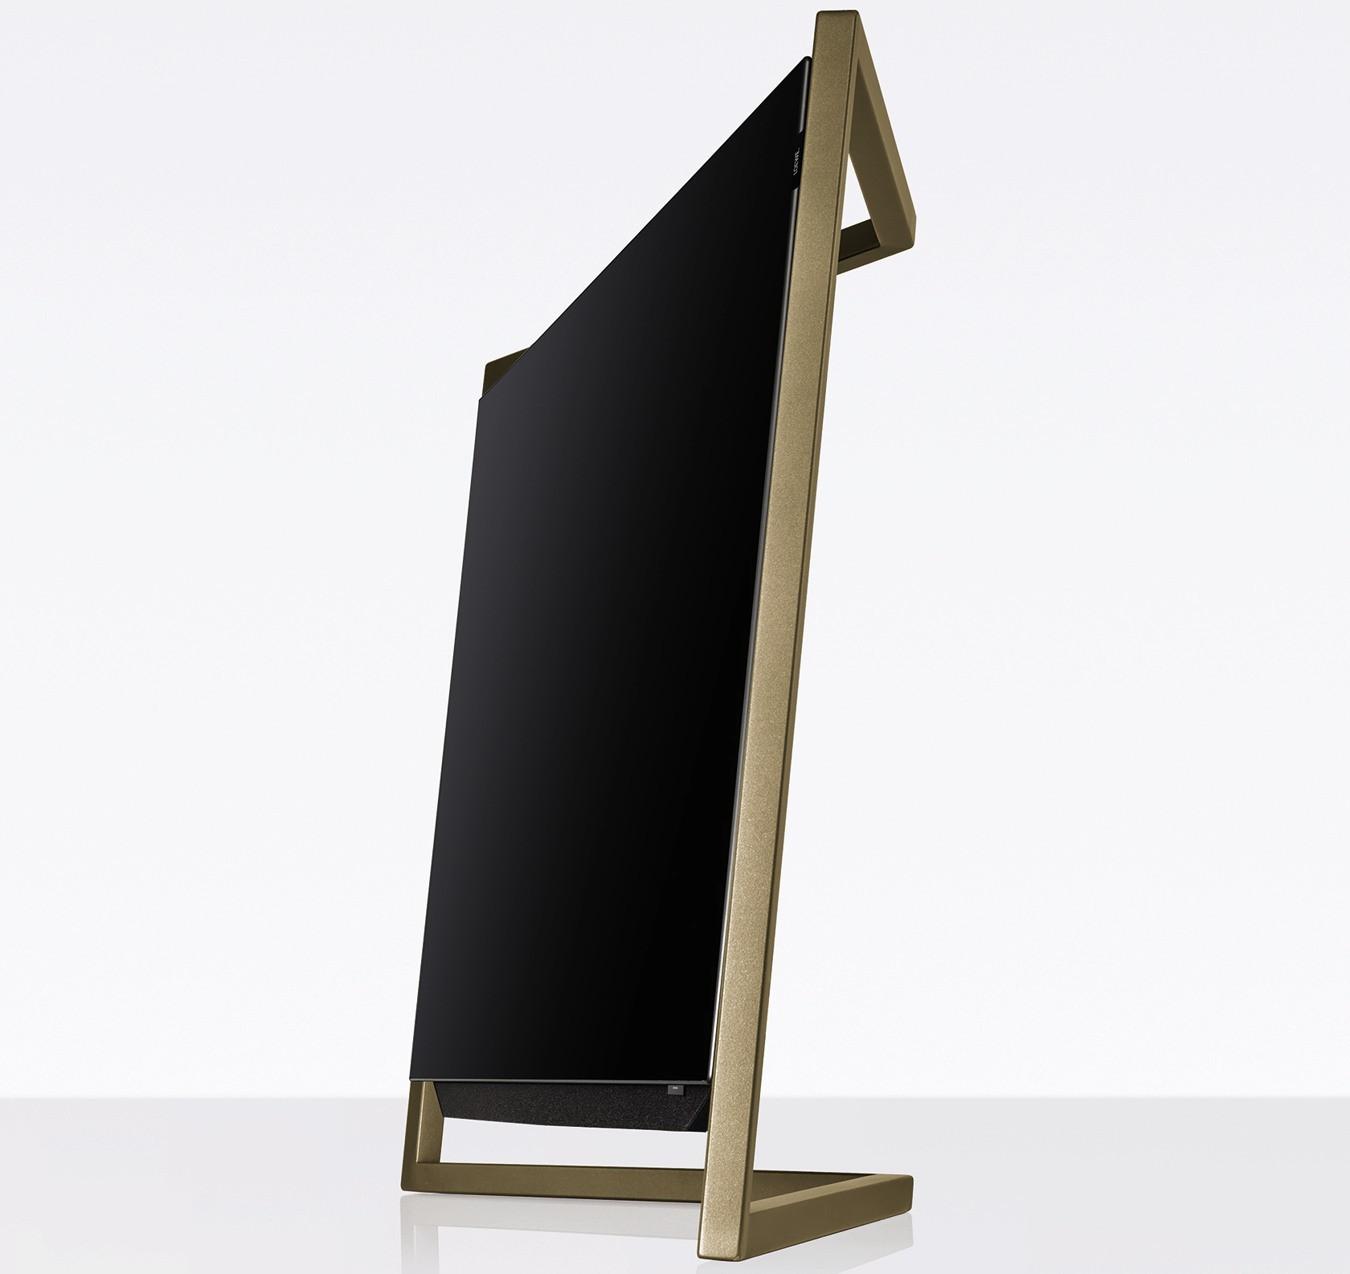 Loewe bild mit tablestand amber gold bild 9 oled for Extremer minimalismus